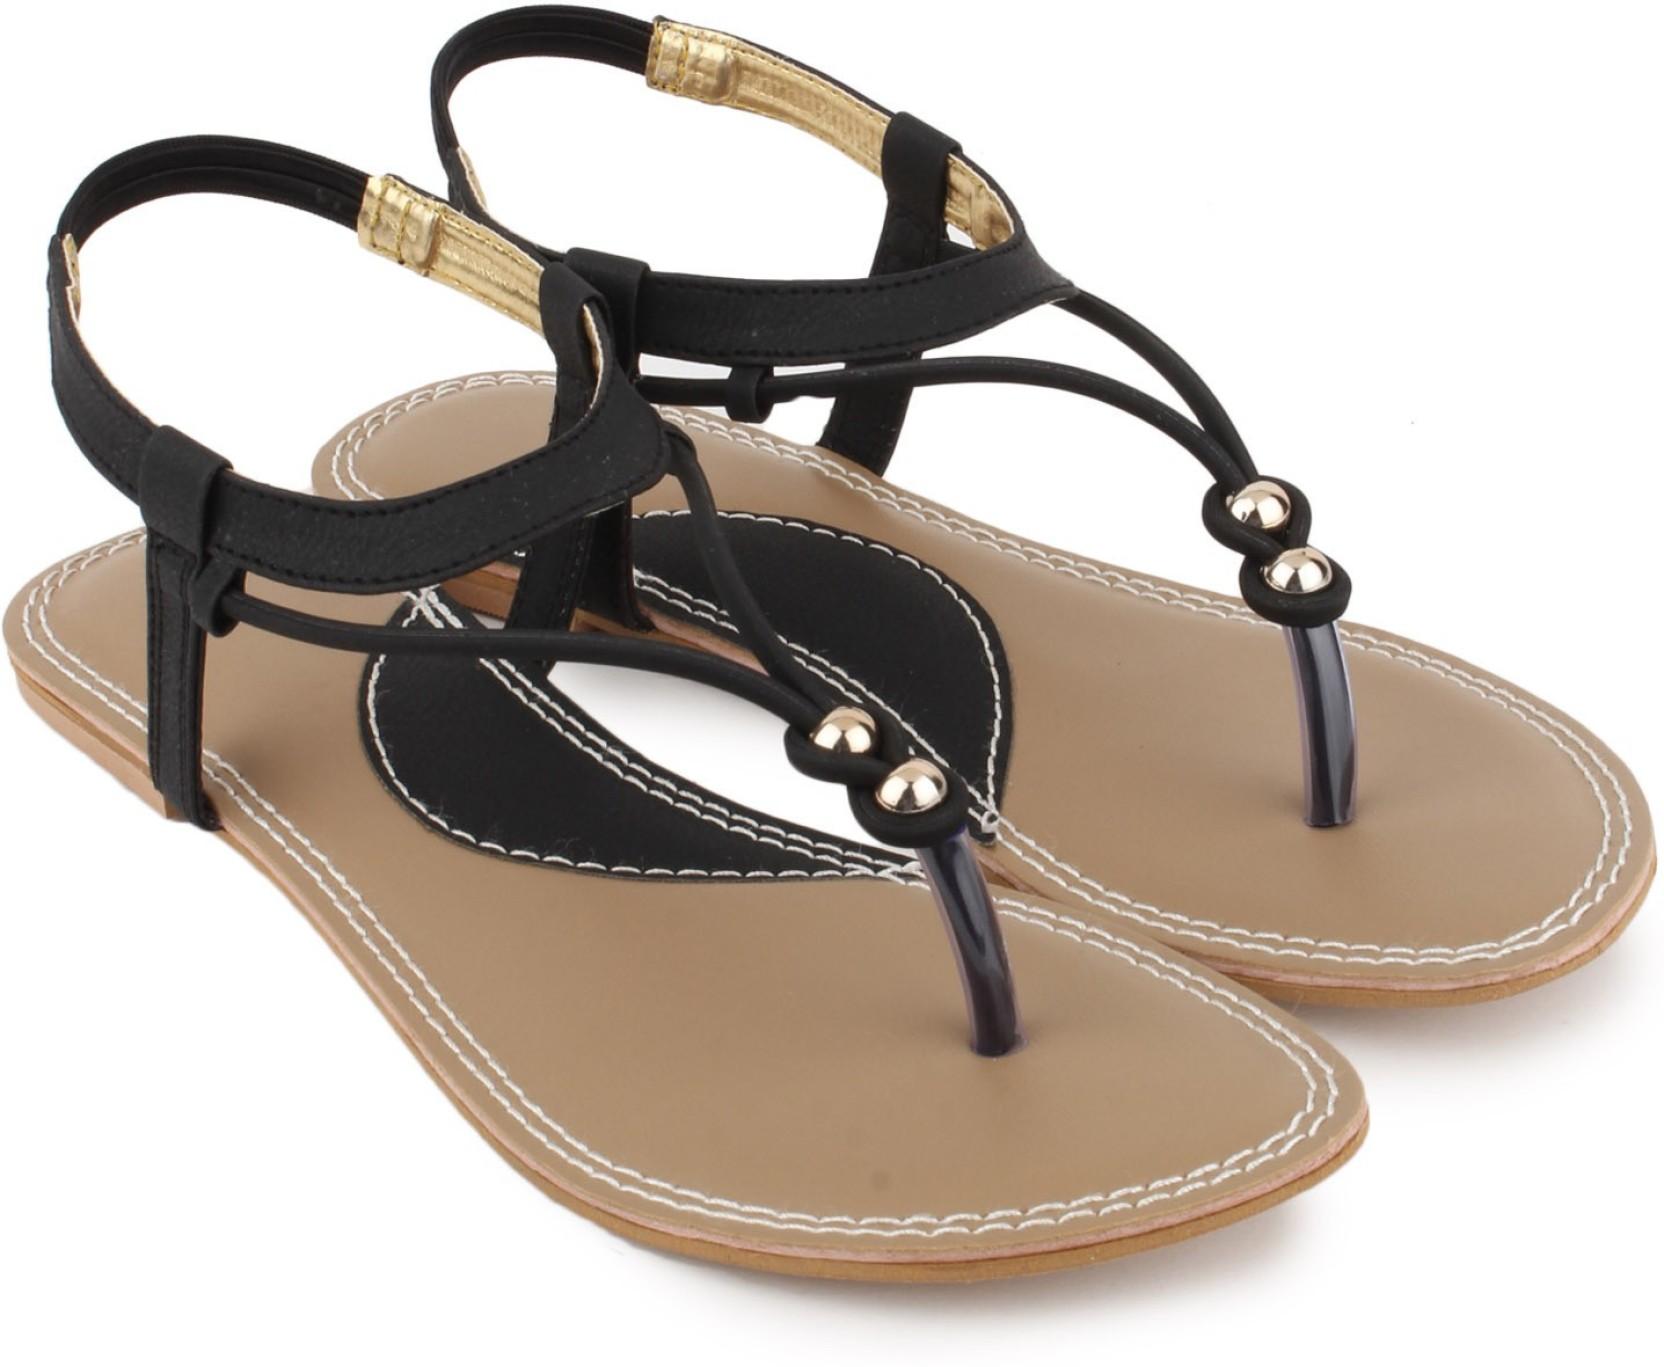 d153fe9d3 Shezone Women Black Flats - Buy Black Color Shezone Women Black ...